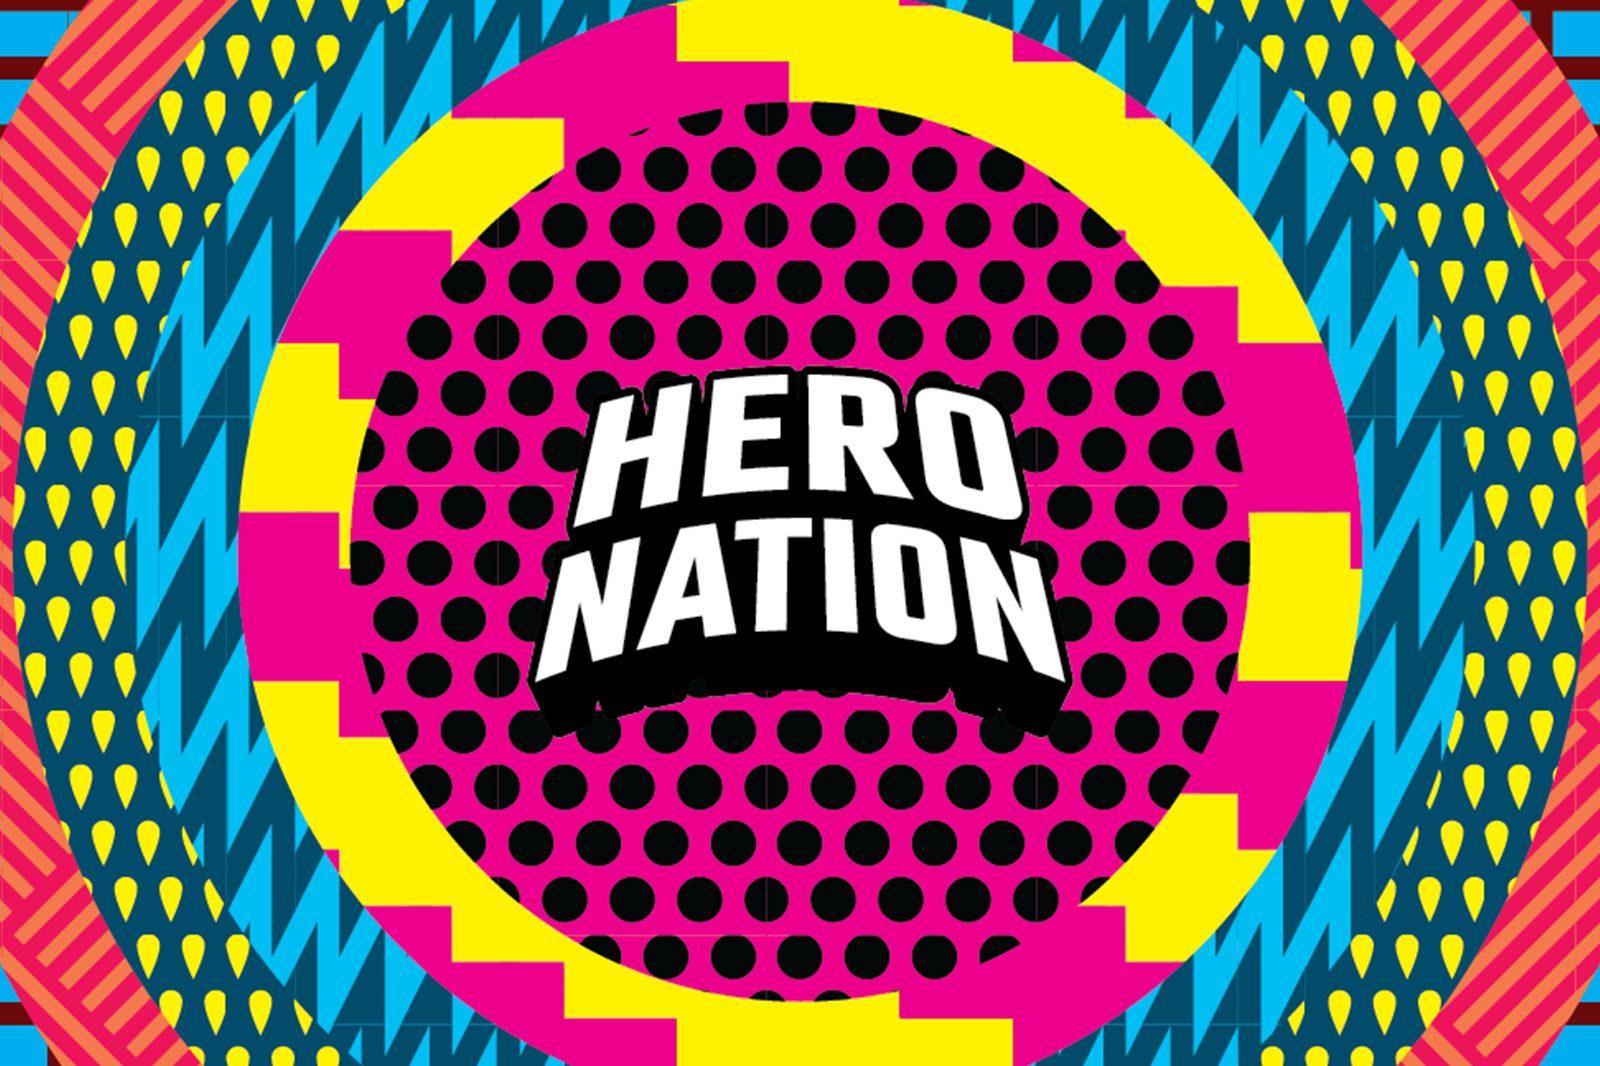 Hero-Nation-Presents-3